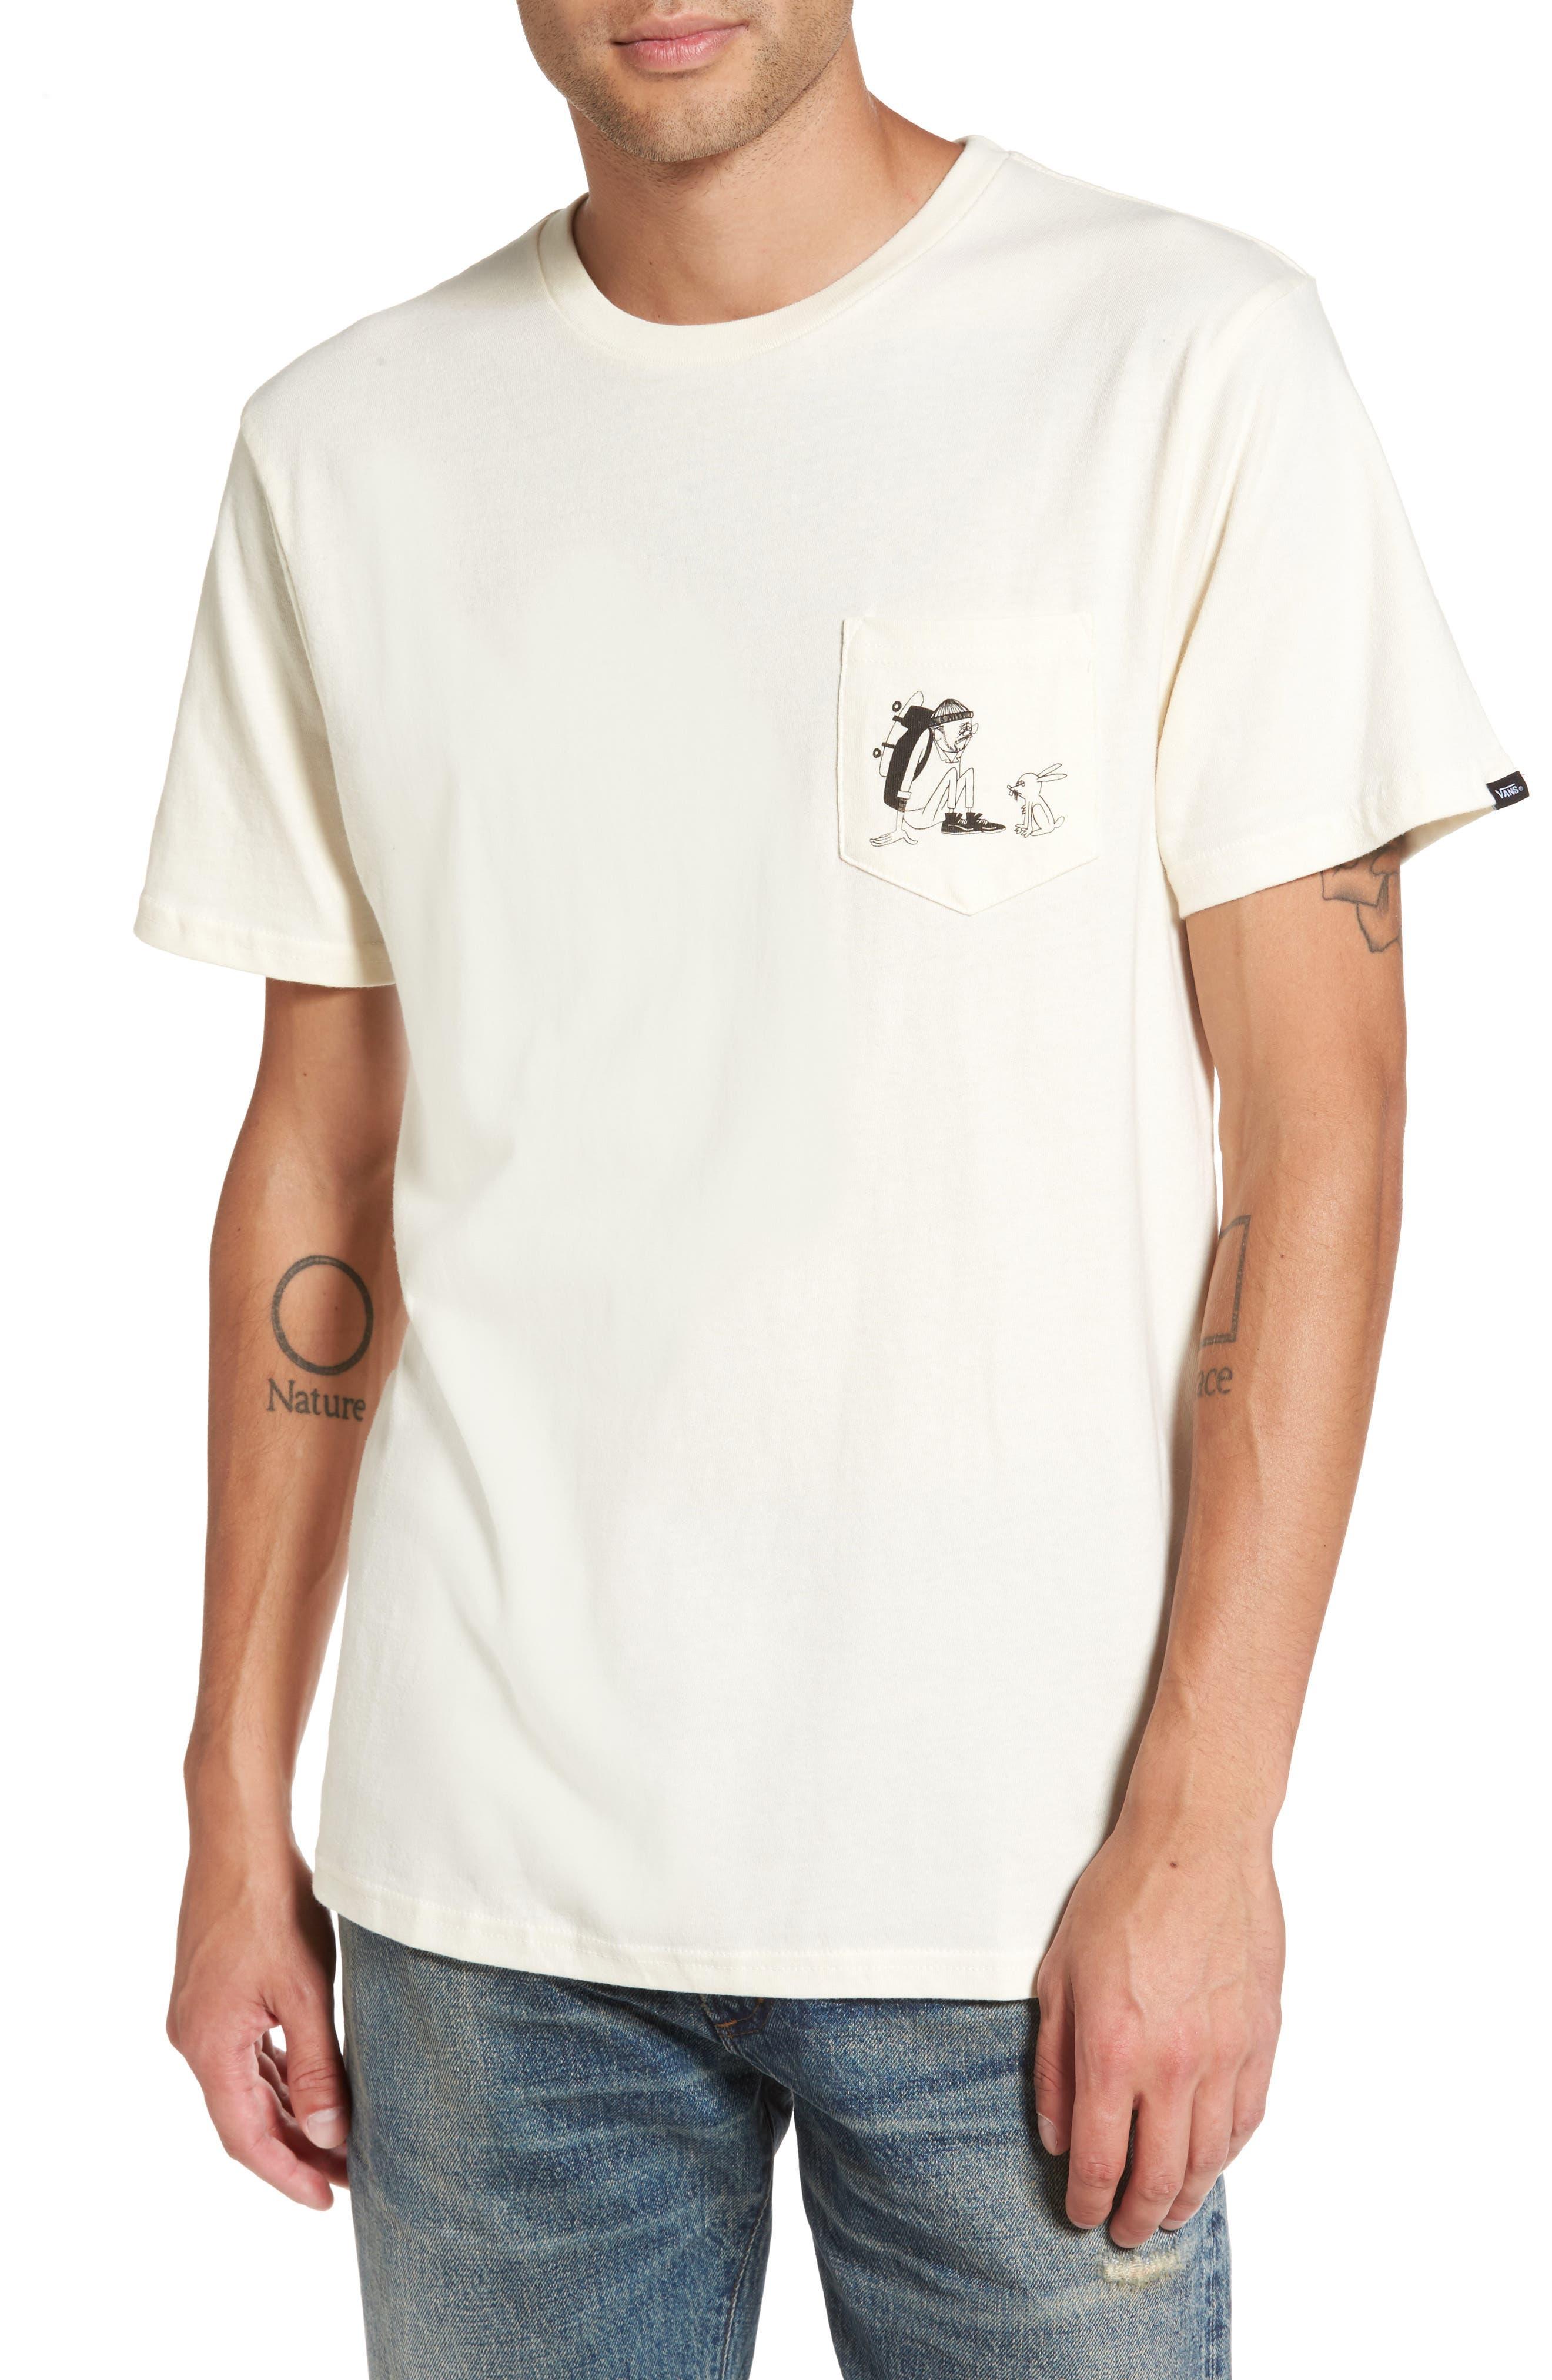 Alternate Image 1 Selected - Vans x Yusuke Hanai Outdoors Graphic Pocket T-Shirt